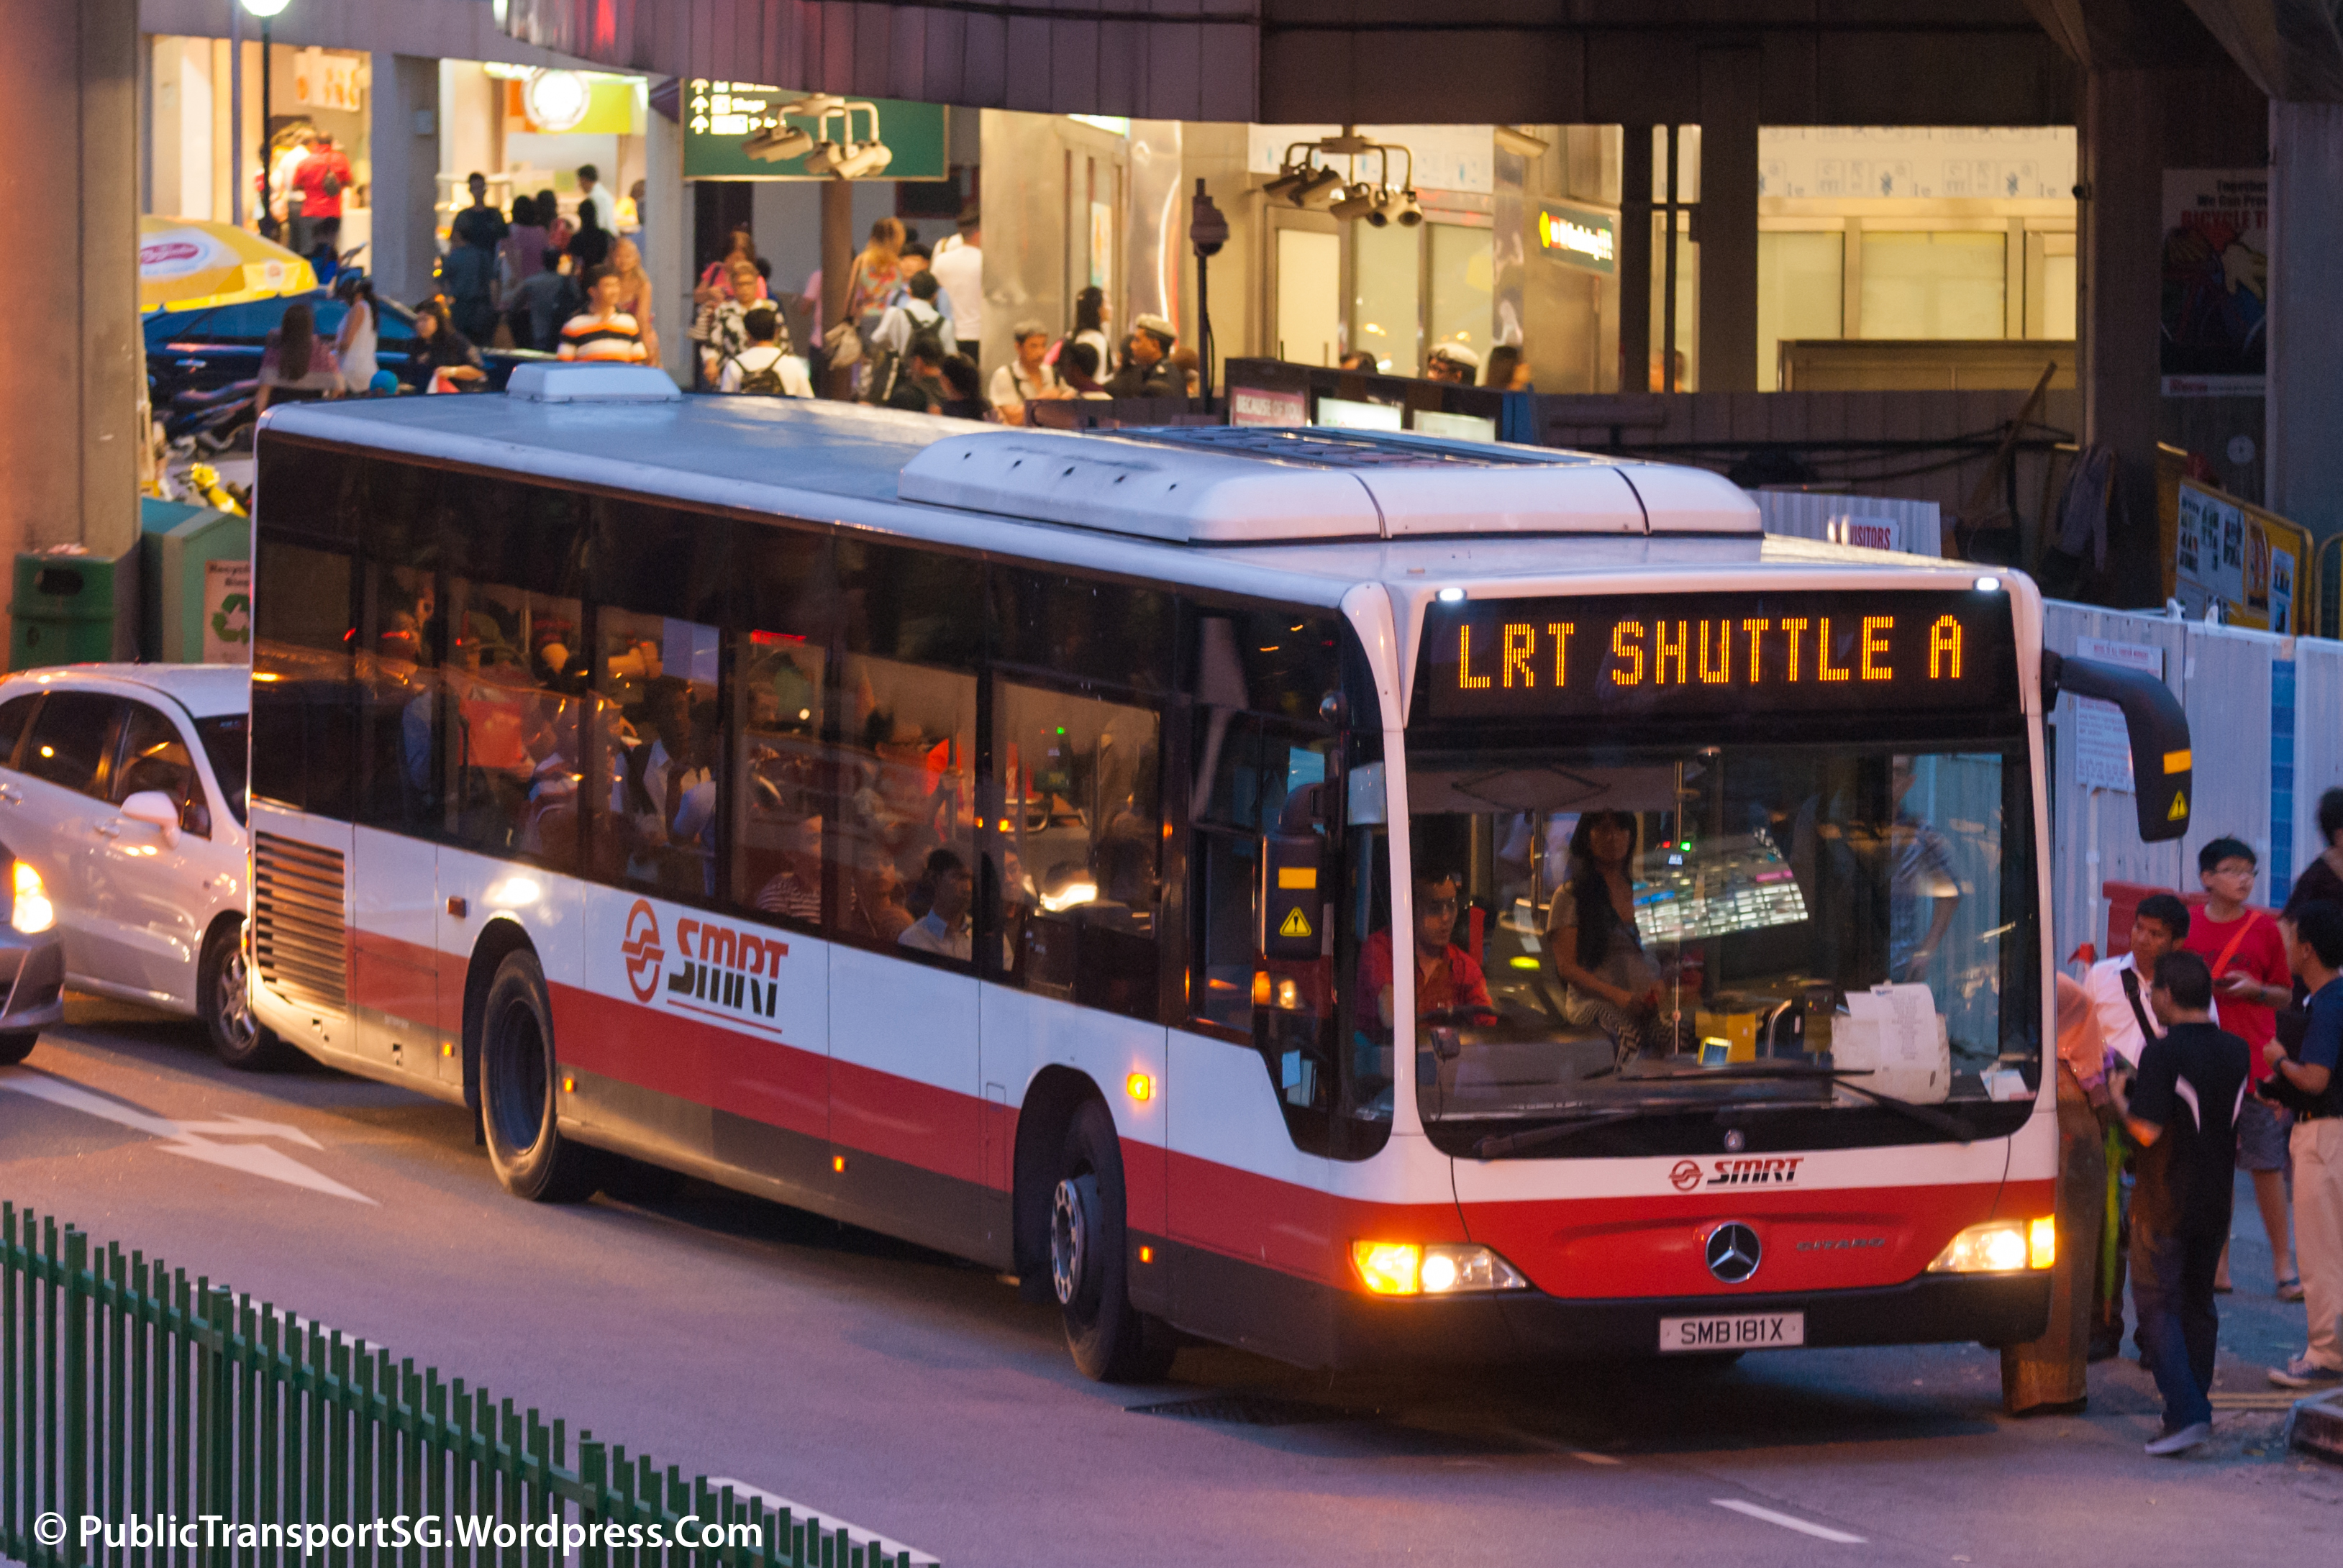 SMB181X - LRT Shuttle A